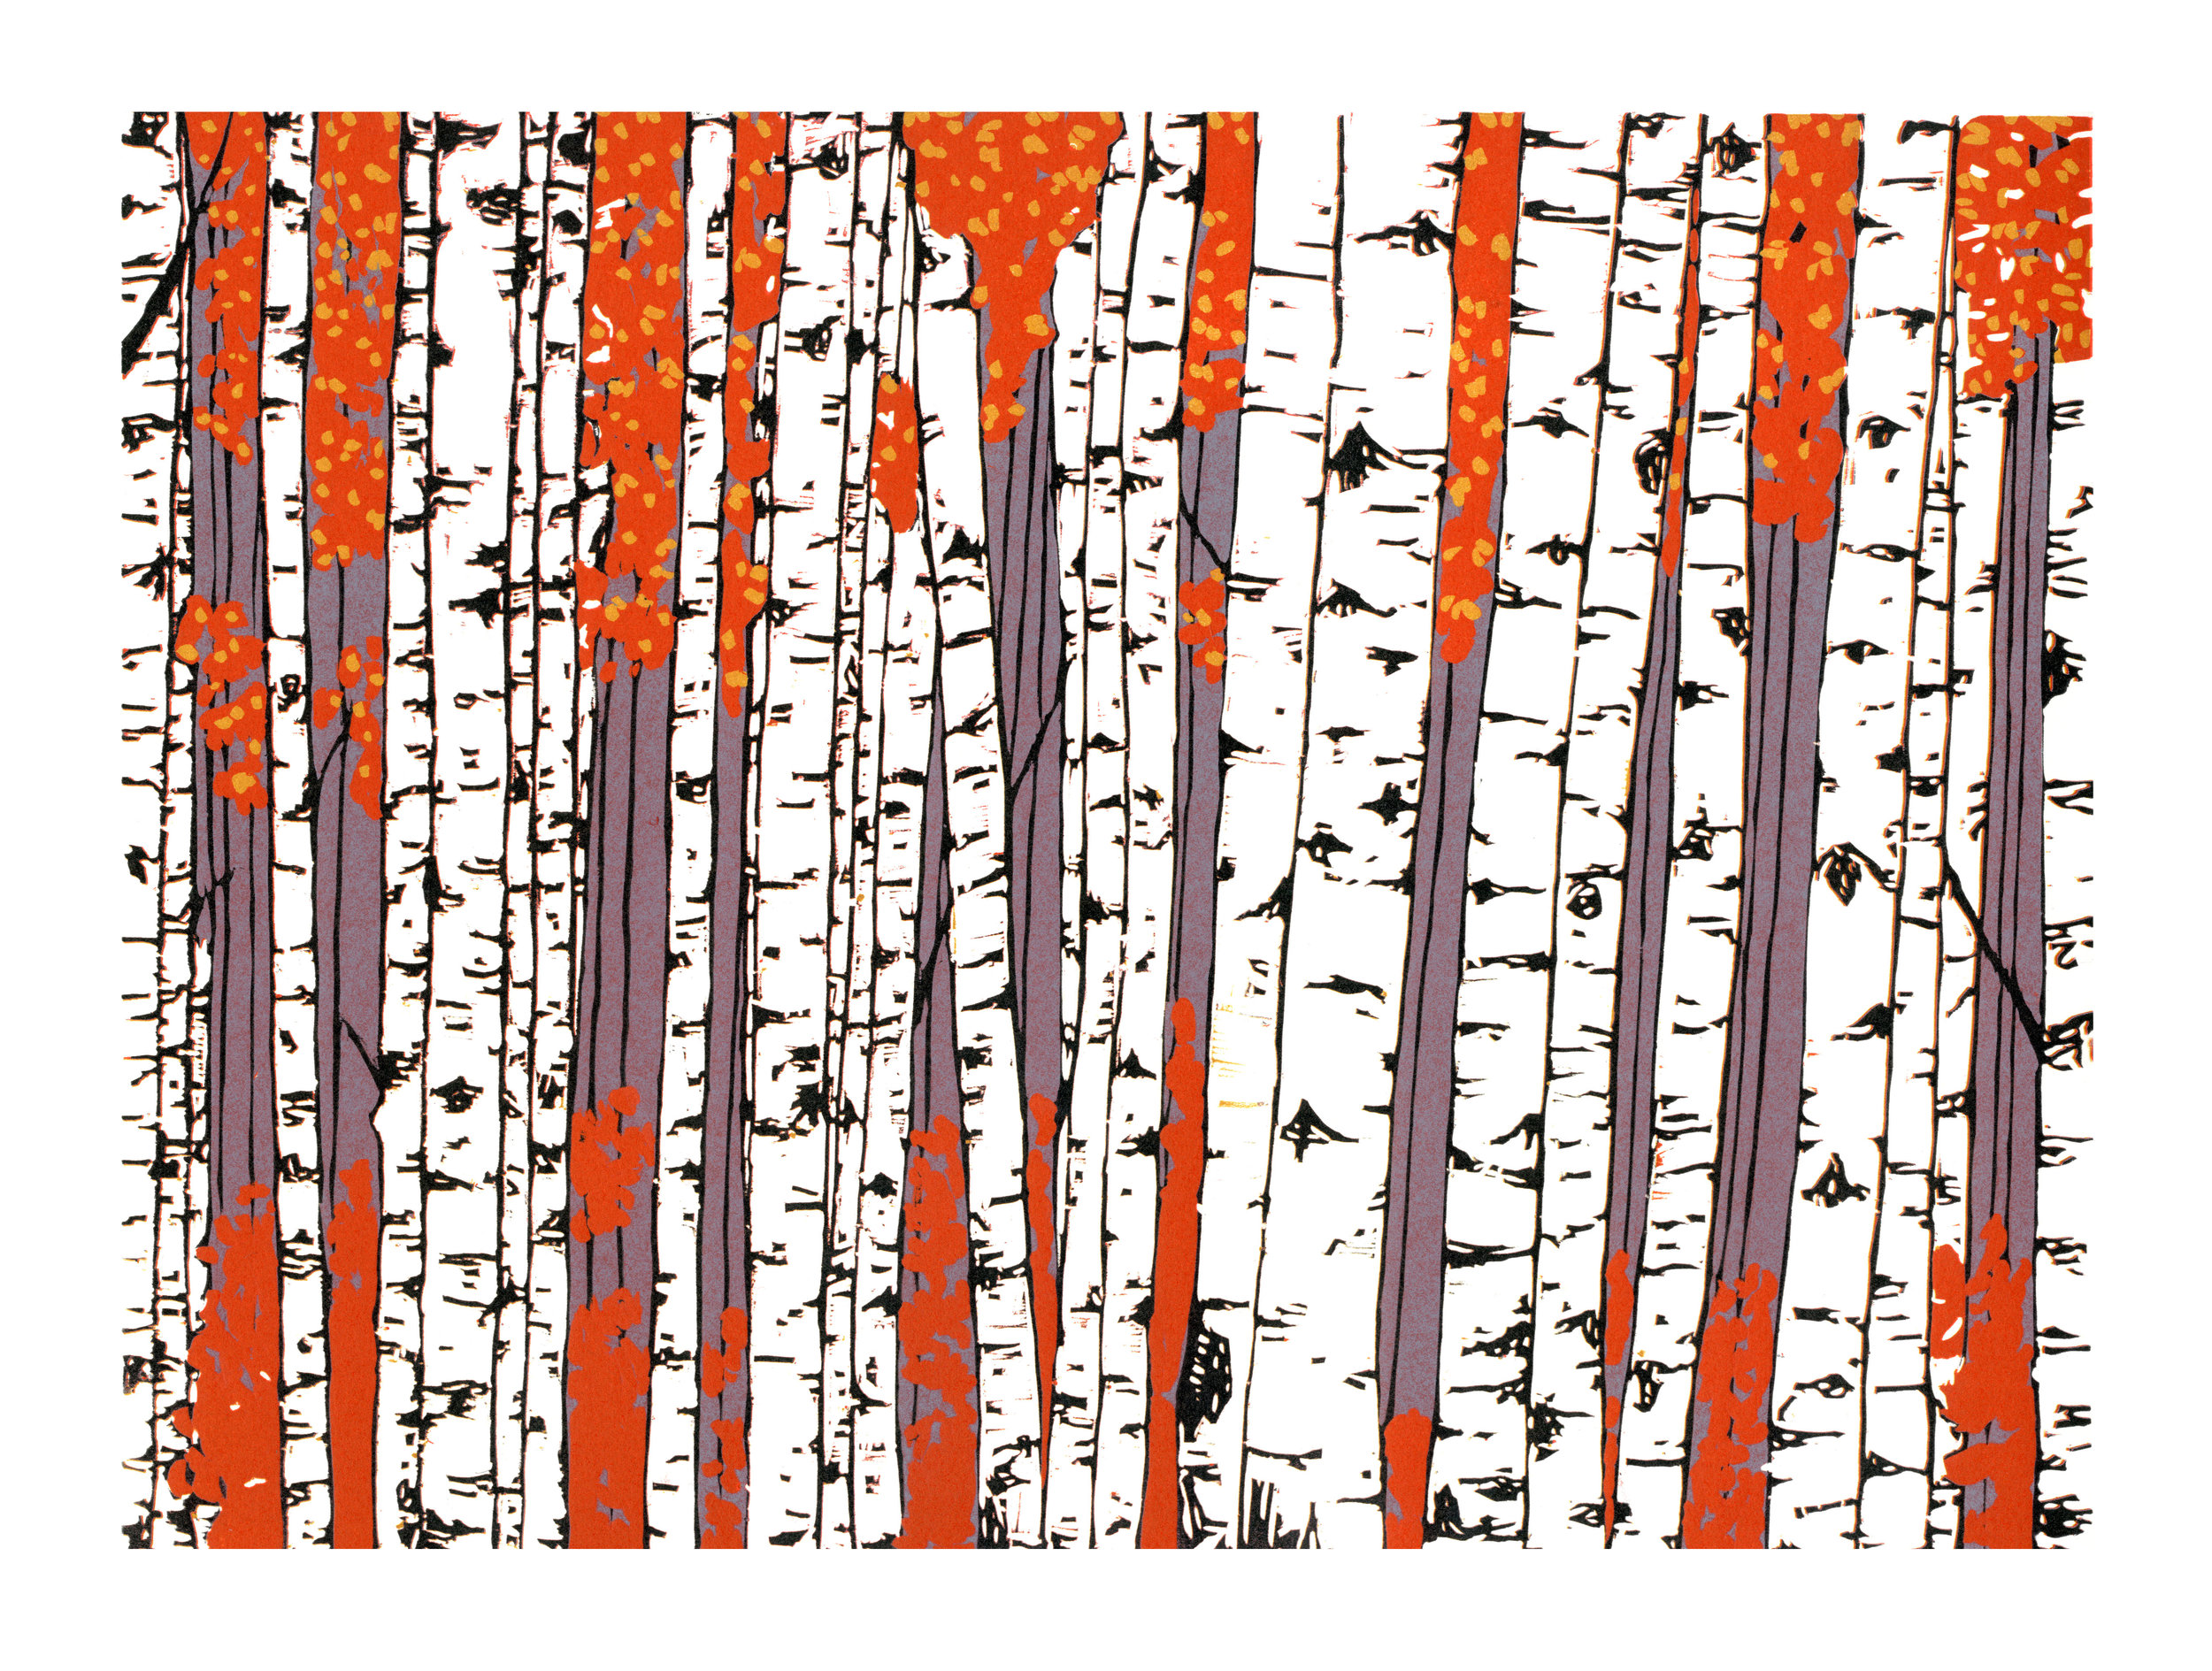 Birch Trees Olga Wieczorek